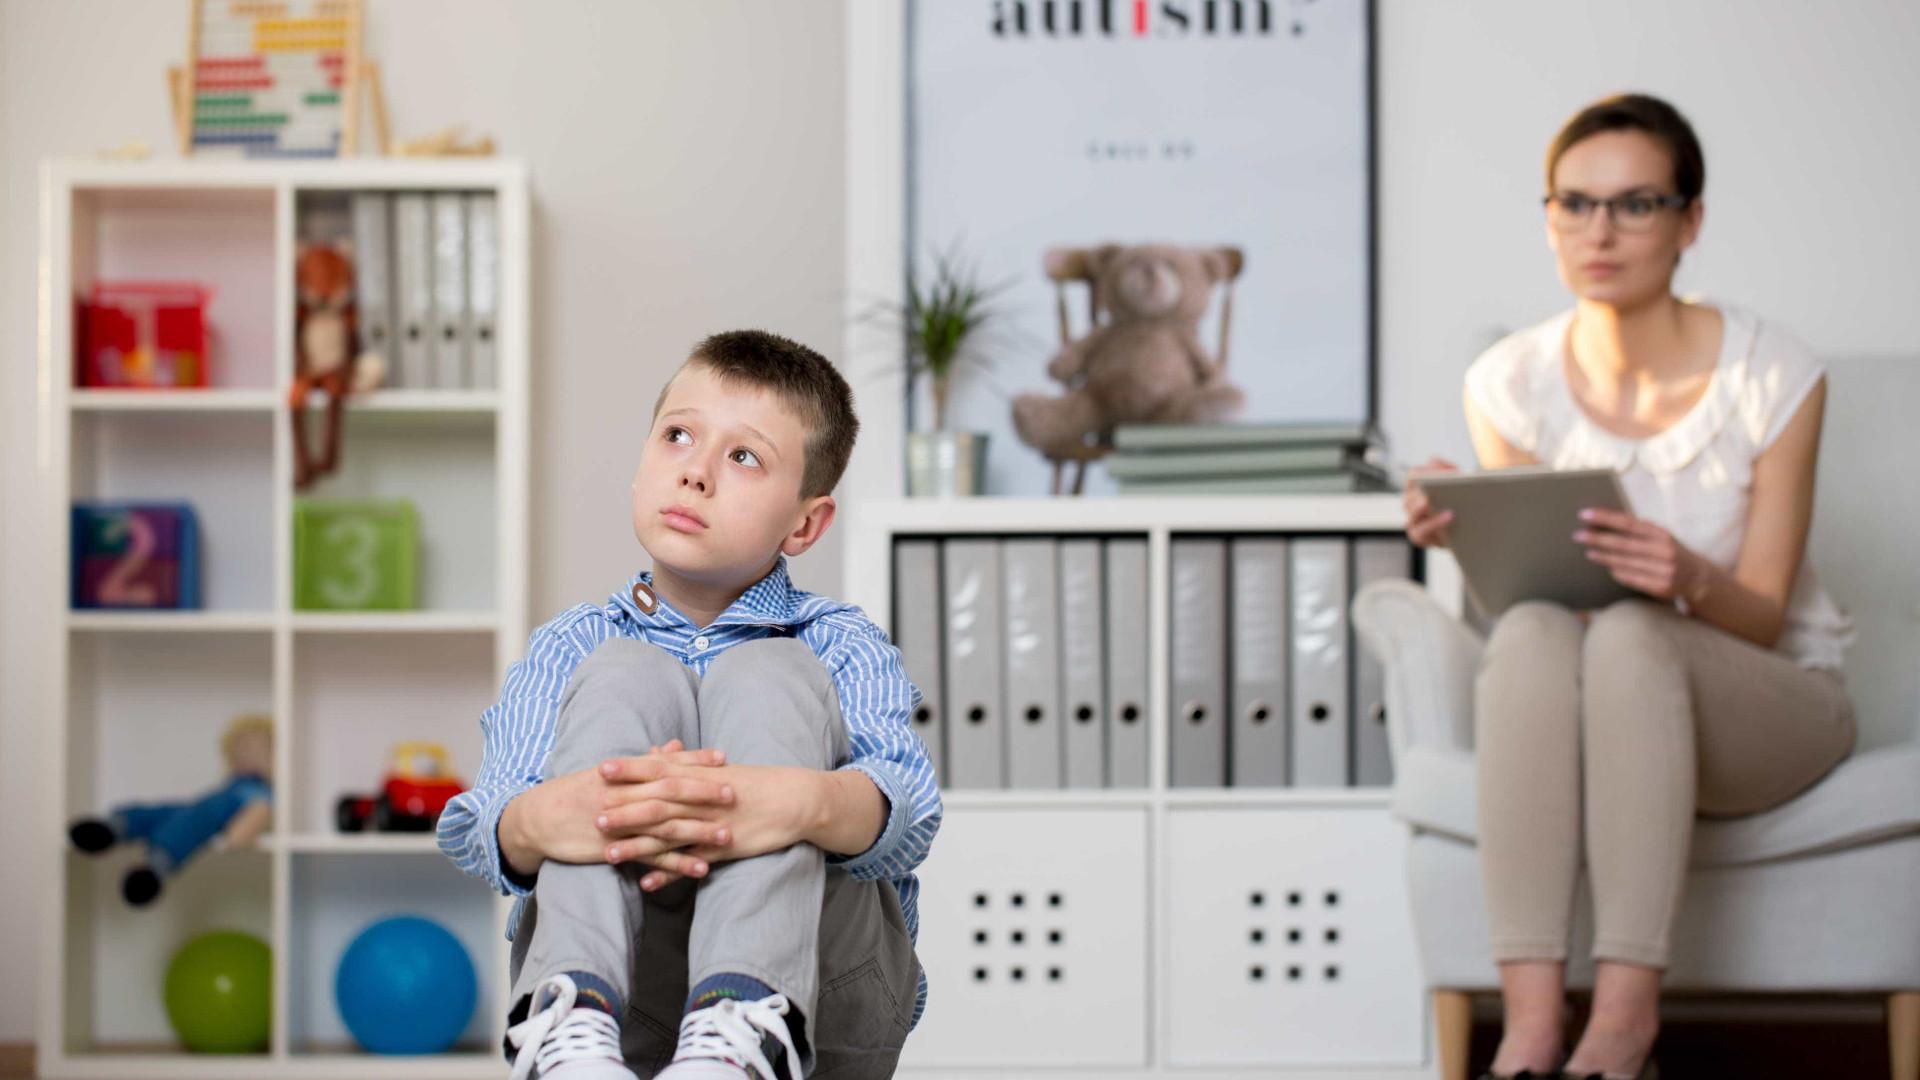 Dificuldade de relacionamento pode ser sinal de Asperger